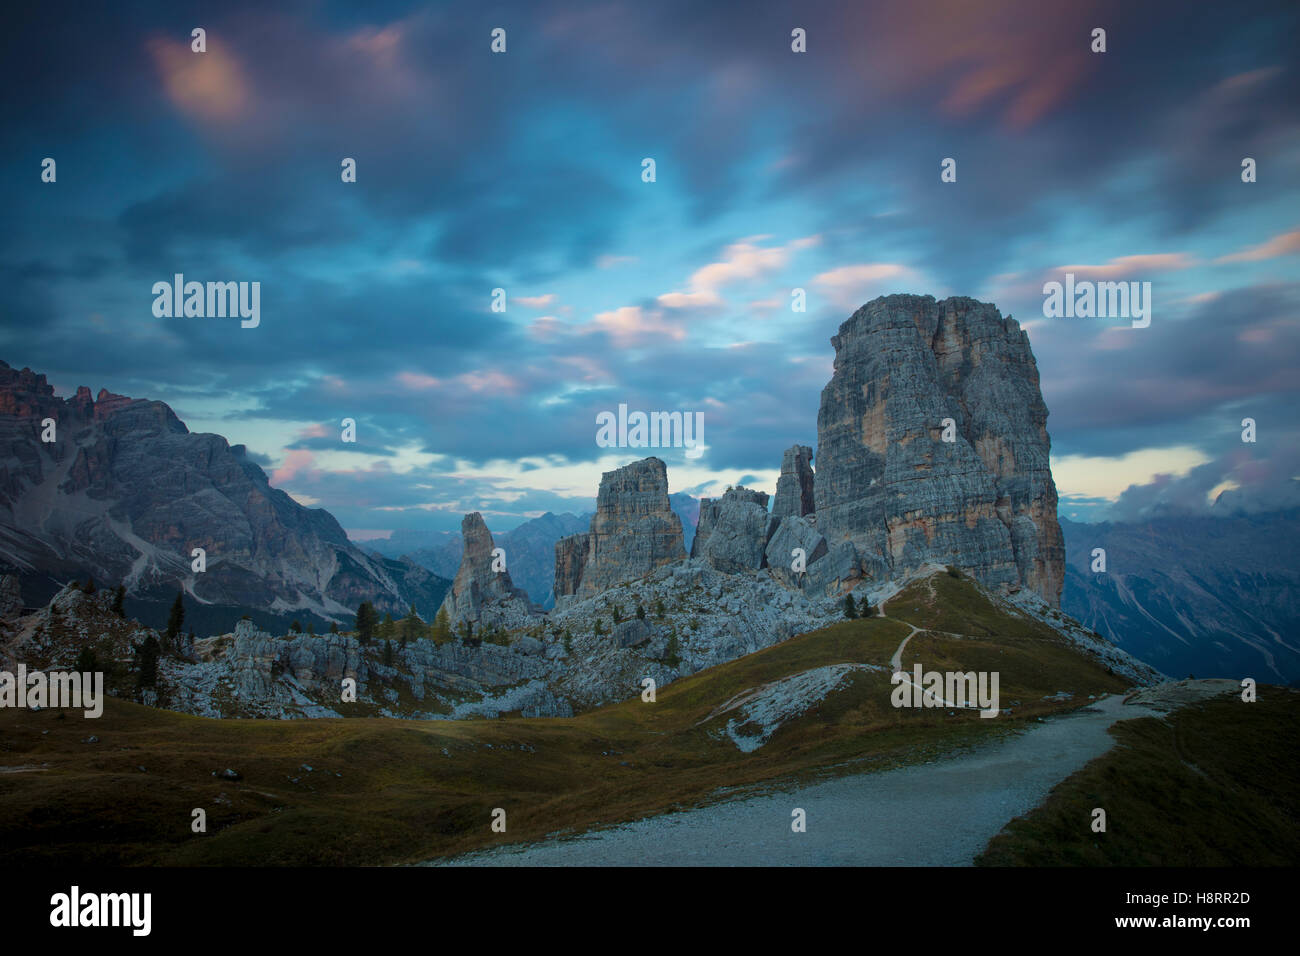 Twilight over the Cinque Torri, Dolomite Mountains, Belluno, Veneto, Italy - Stock Image